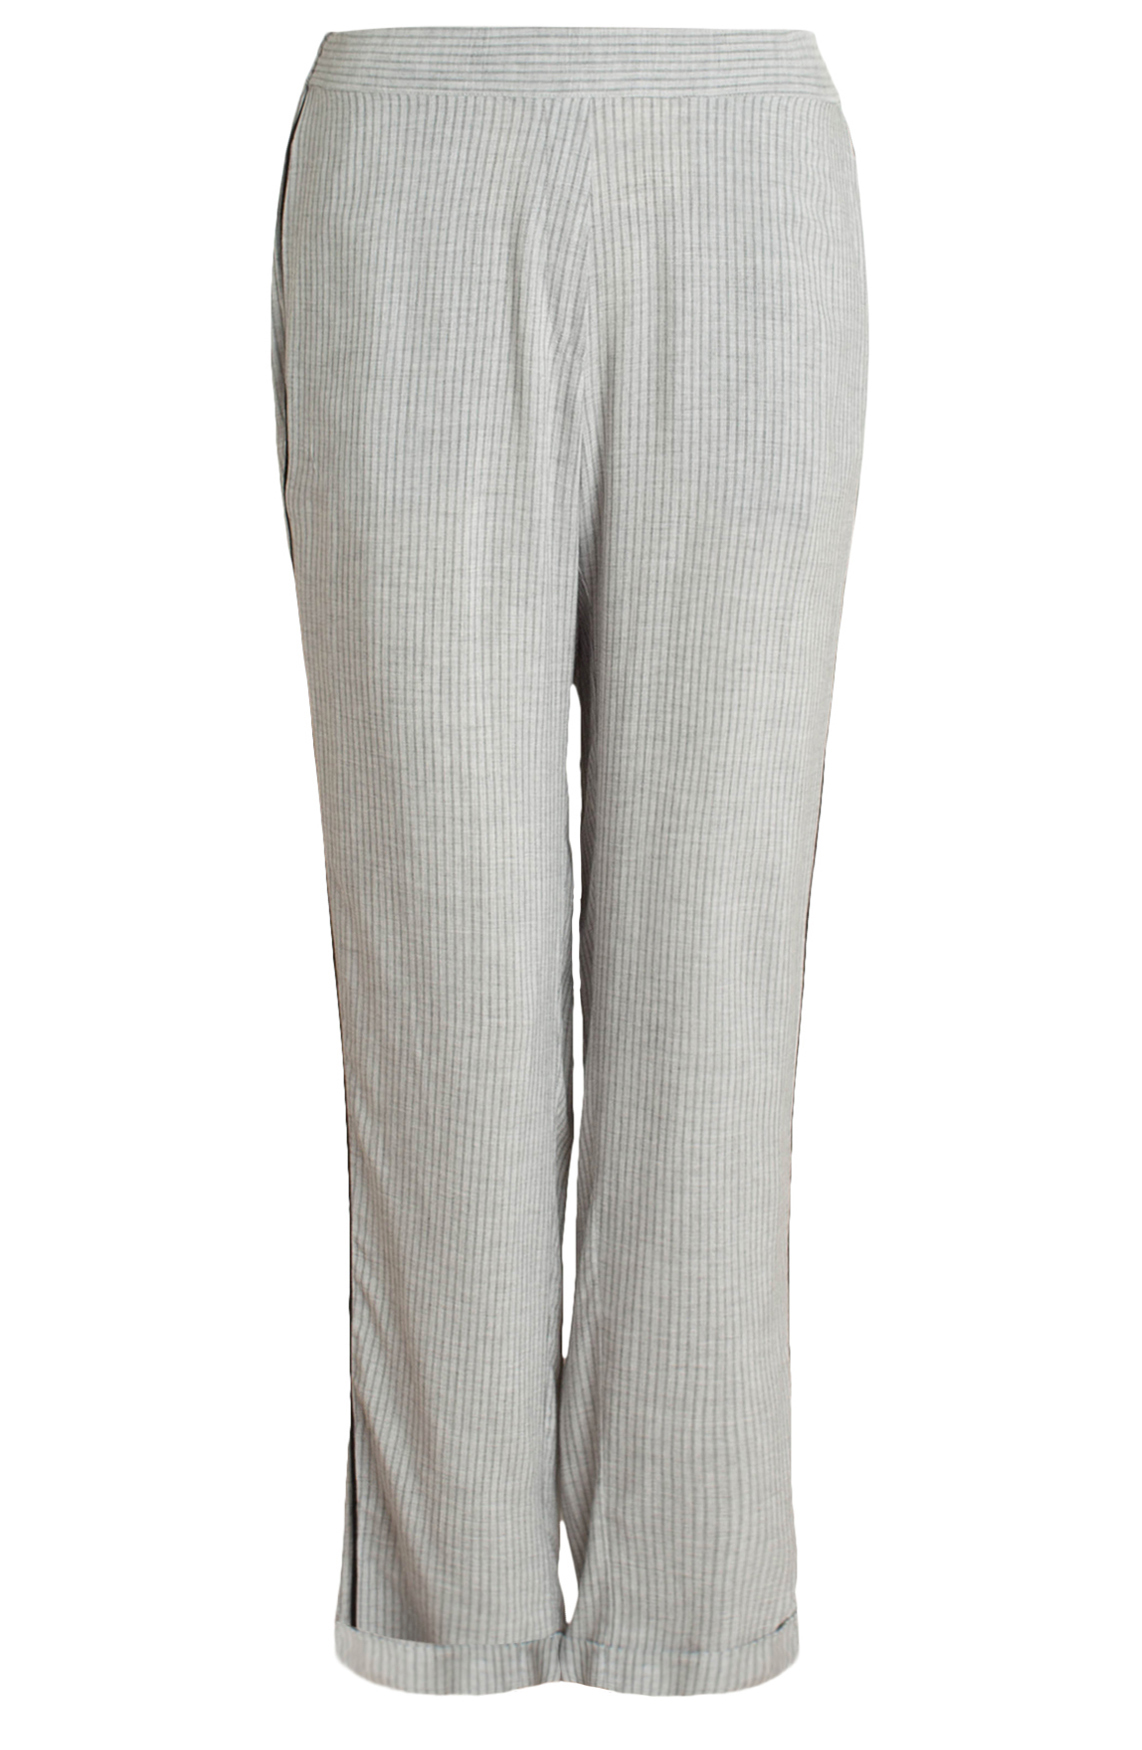 Moscow Dames Stripy pants Grijs